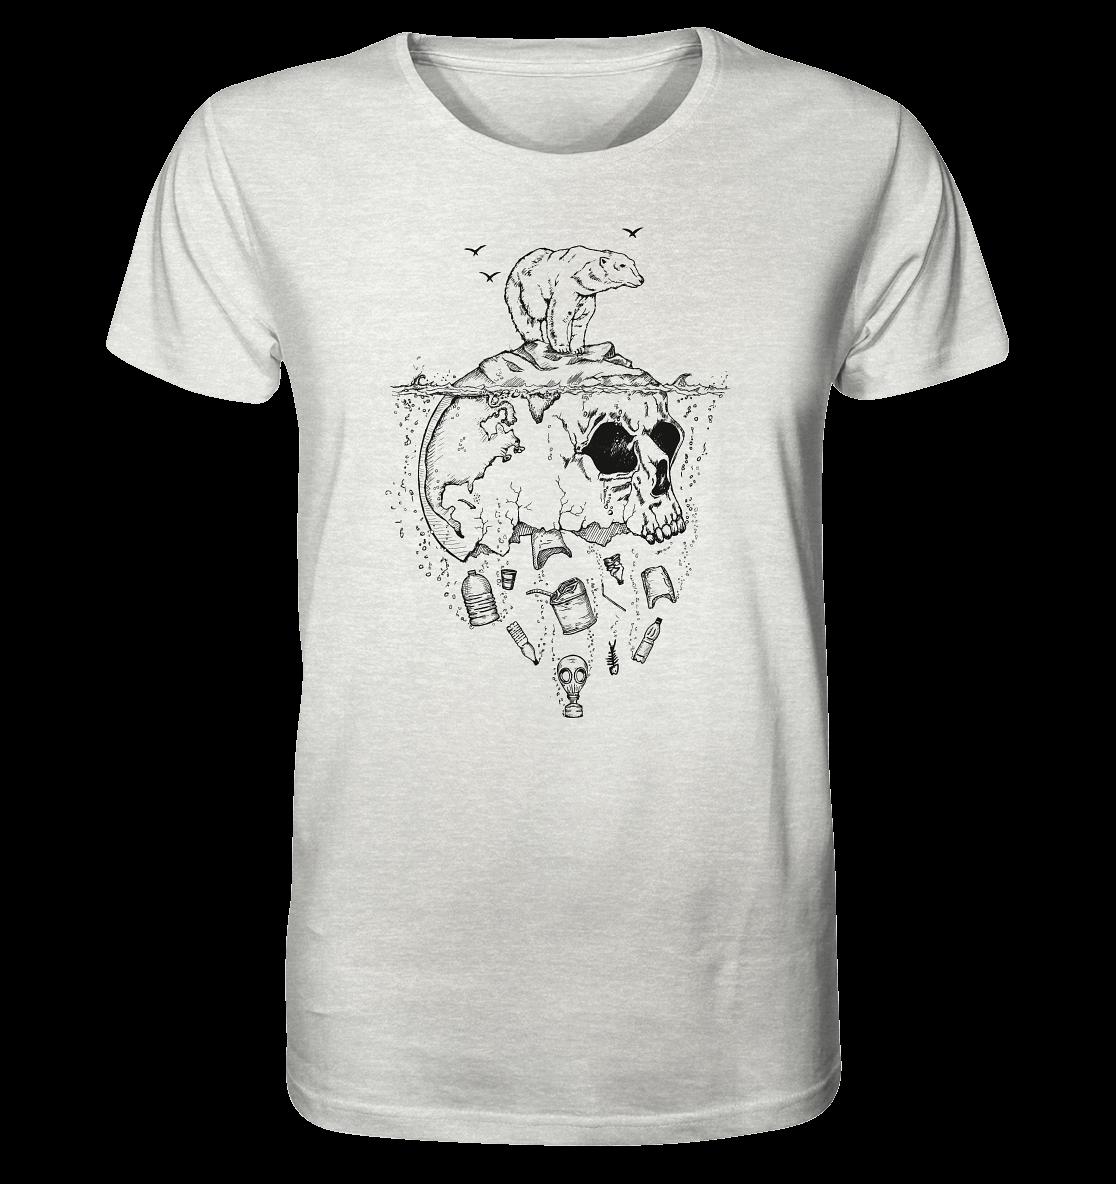 front-organic-shirt-meliert-f2f5f3-1116x-3.png